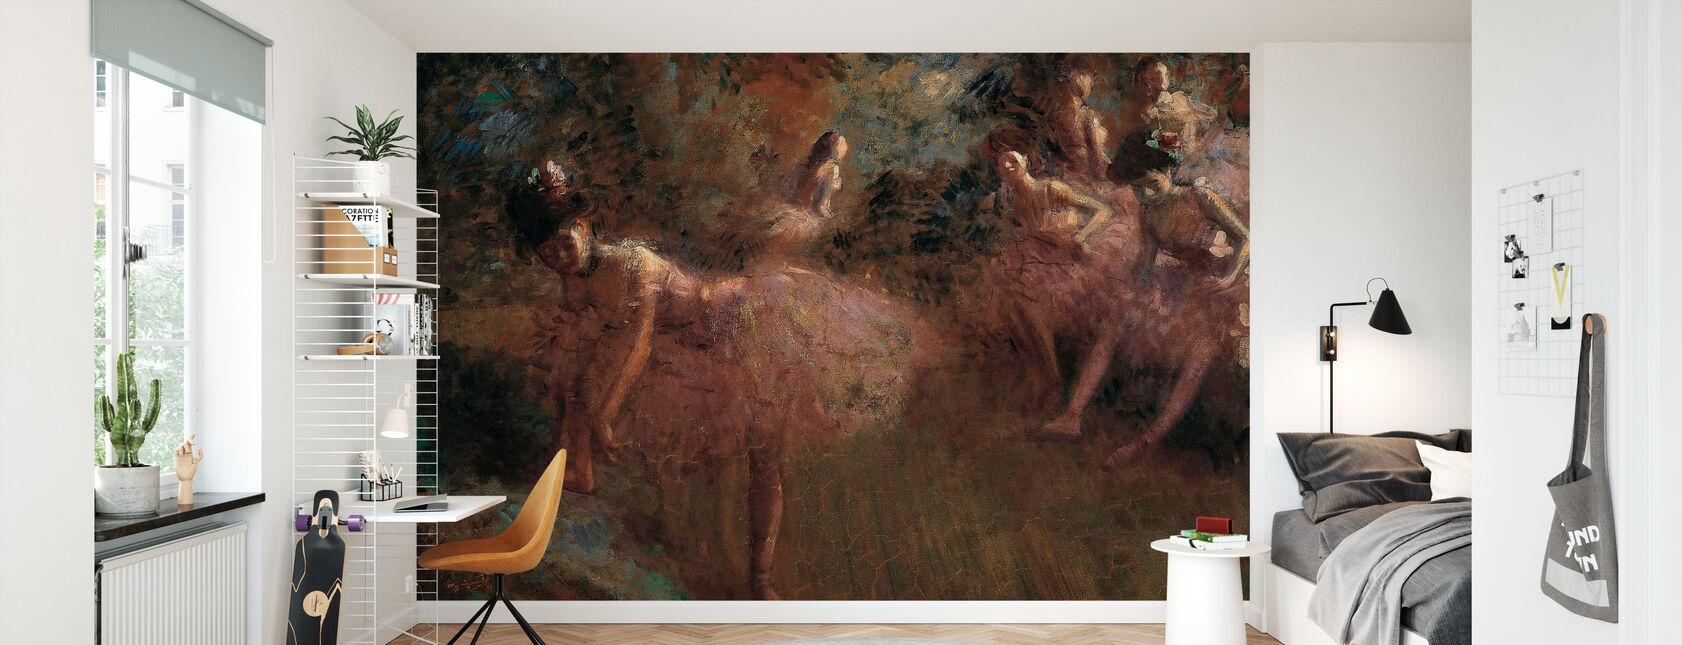 Dancers in Pink - Jean Louis Forain - Wallpaper - Kids Room